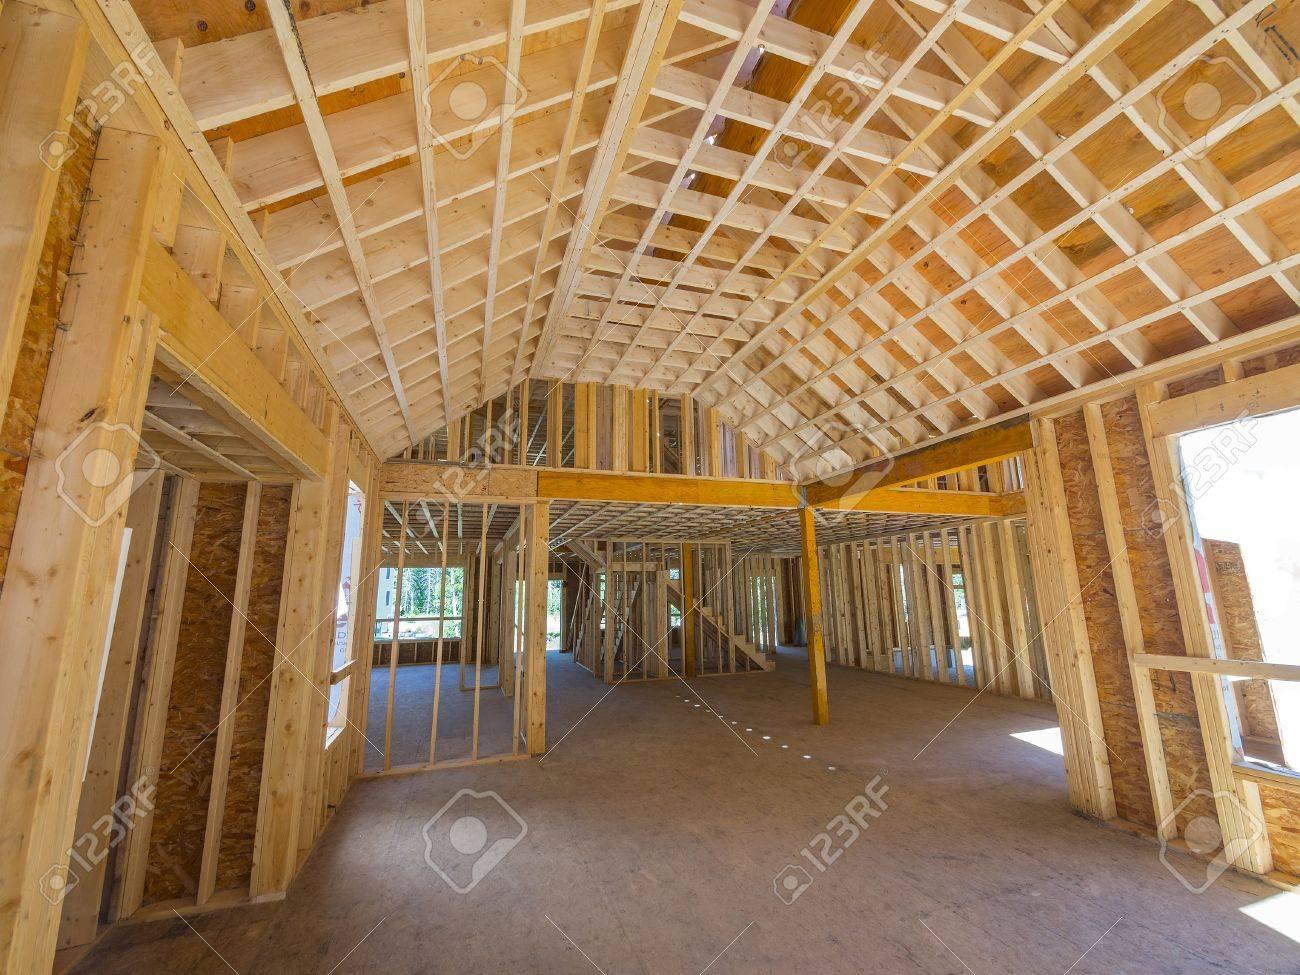 New house interior framing Stock Photo - 21936126